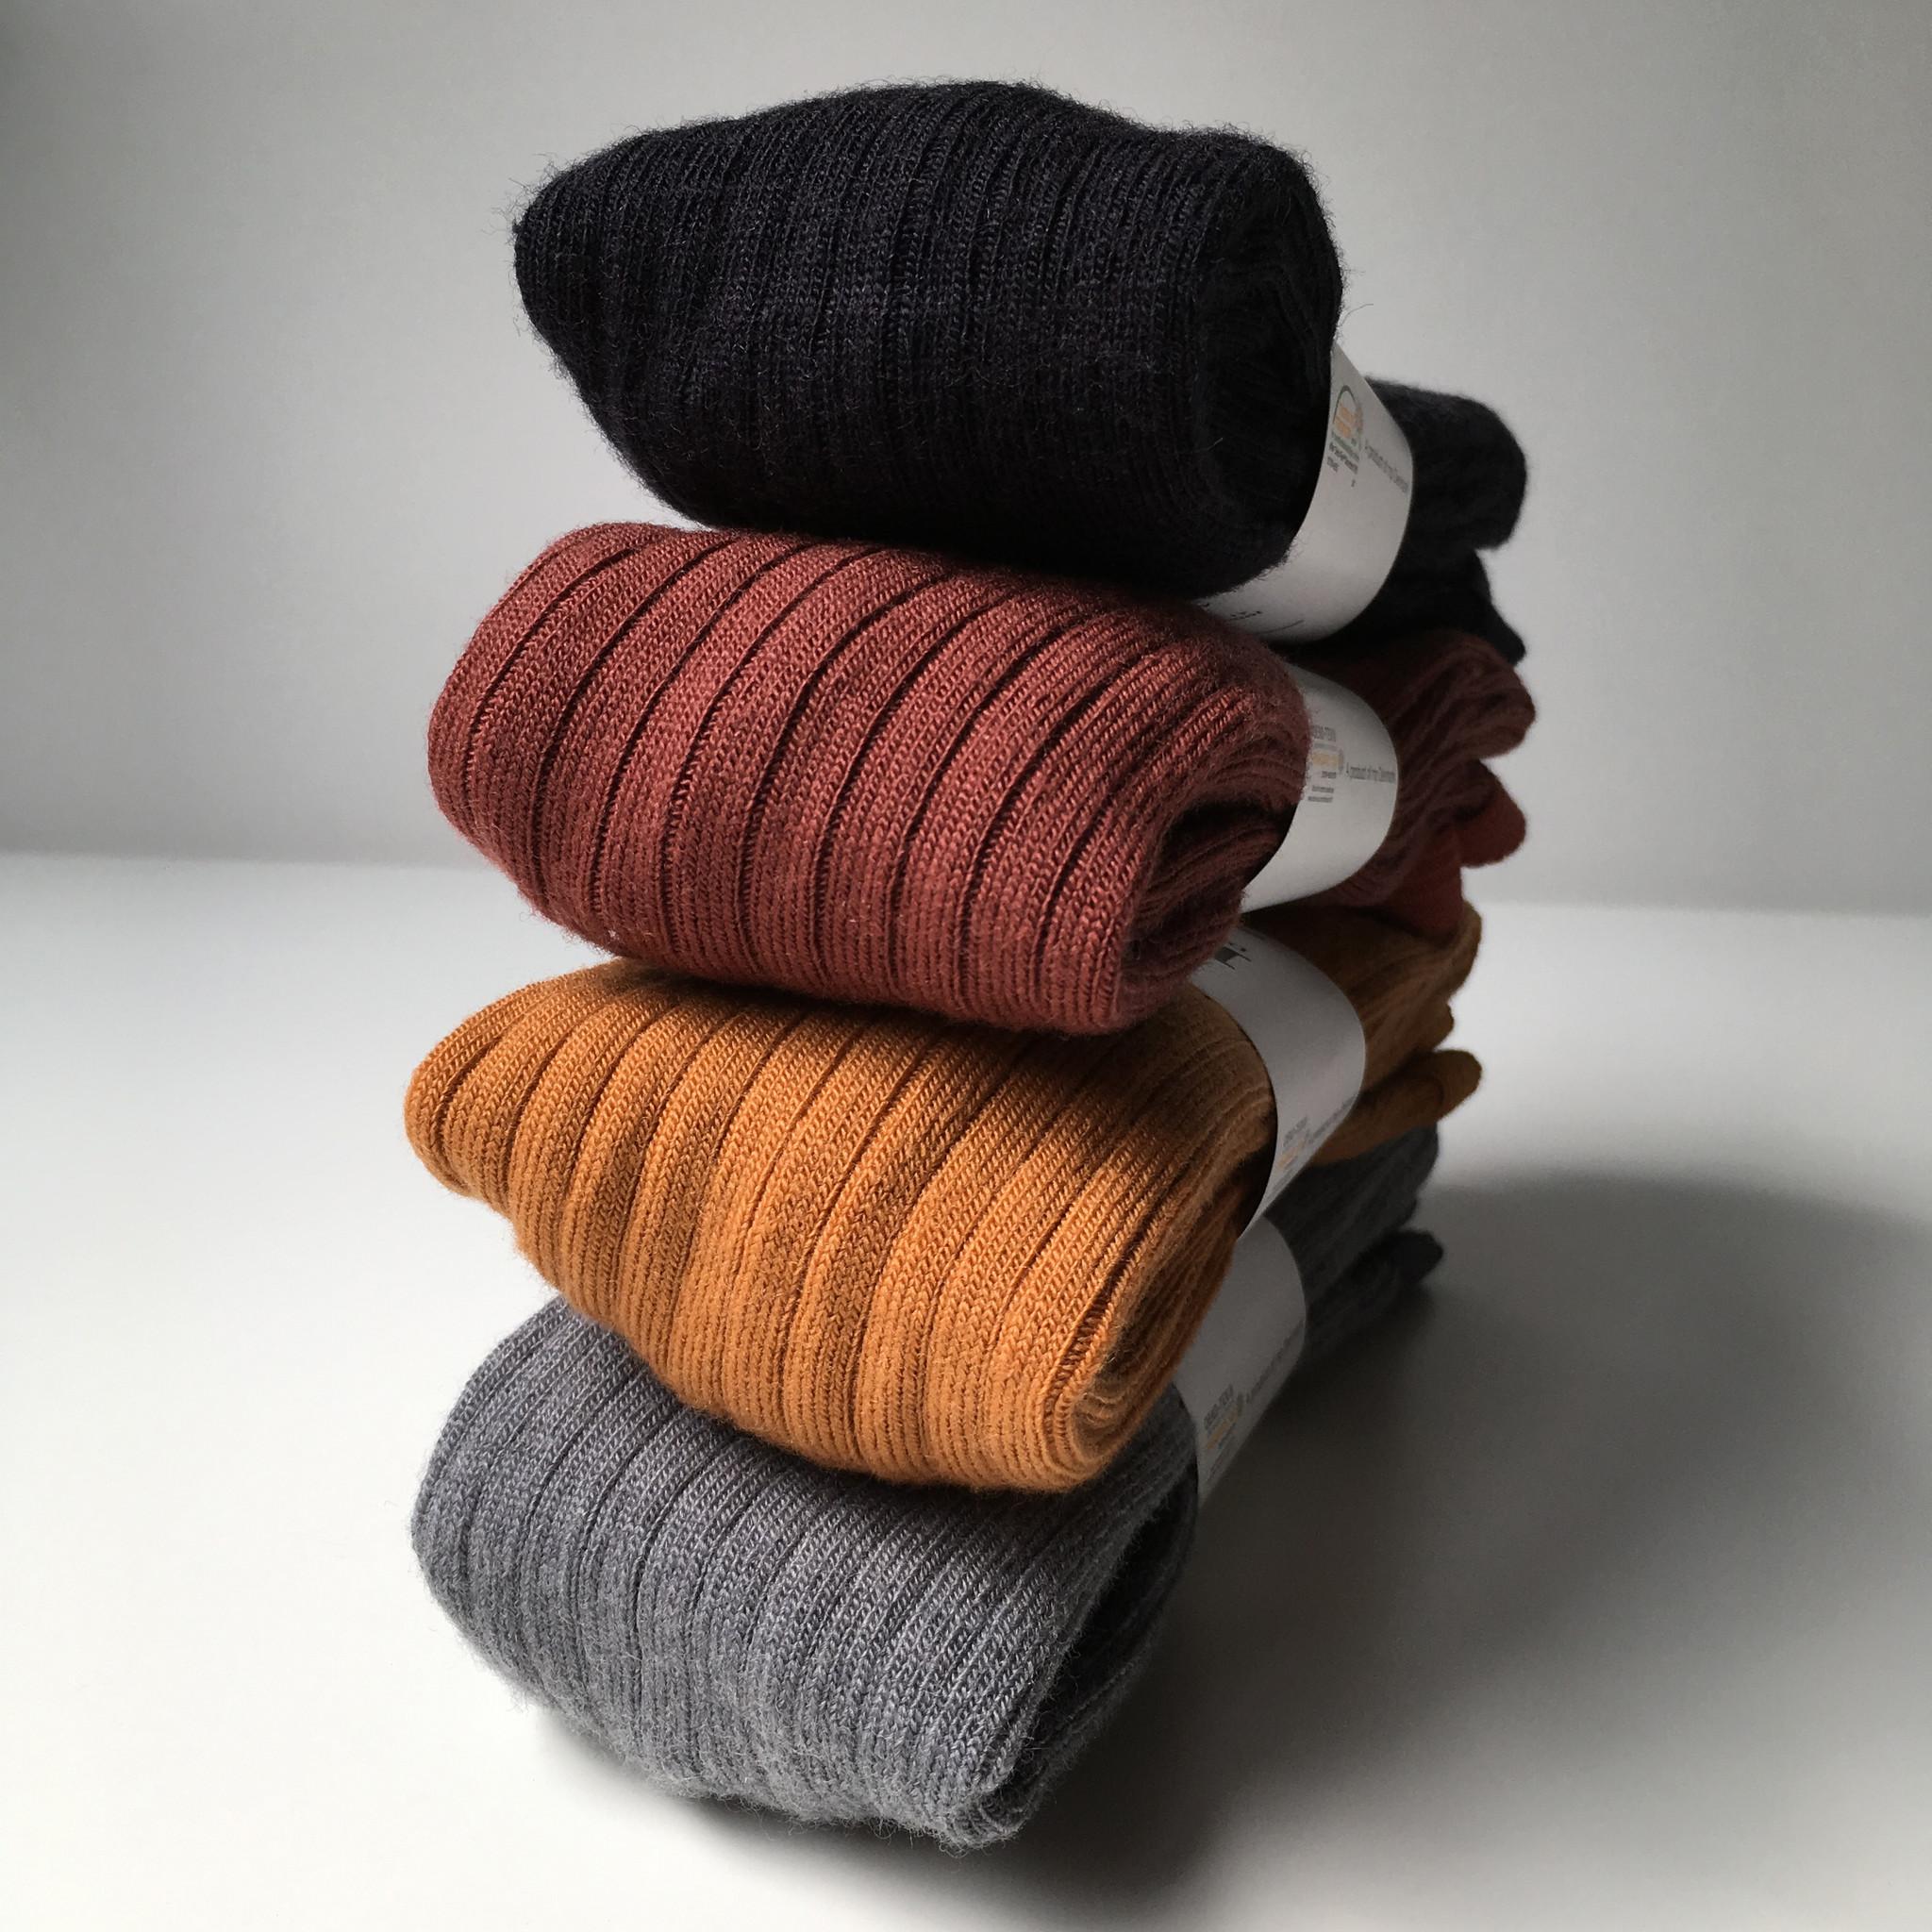 MP Denmark wool tights  - ribbed - grey marled - 80 to 160